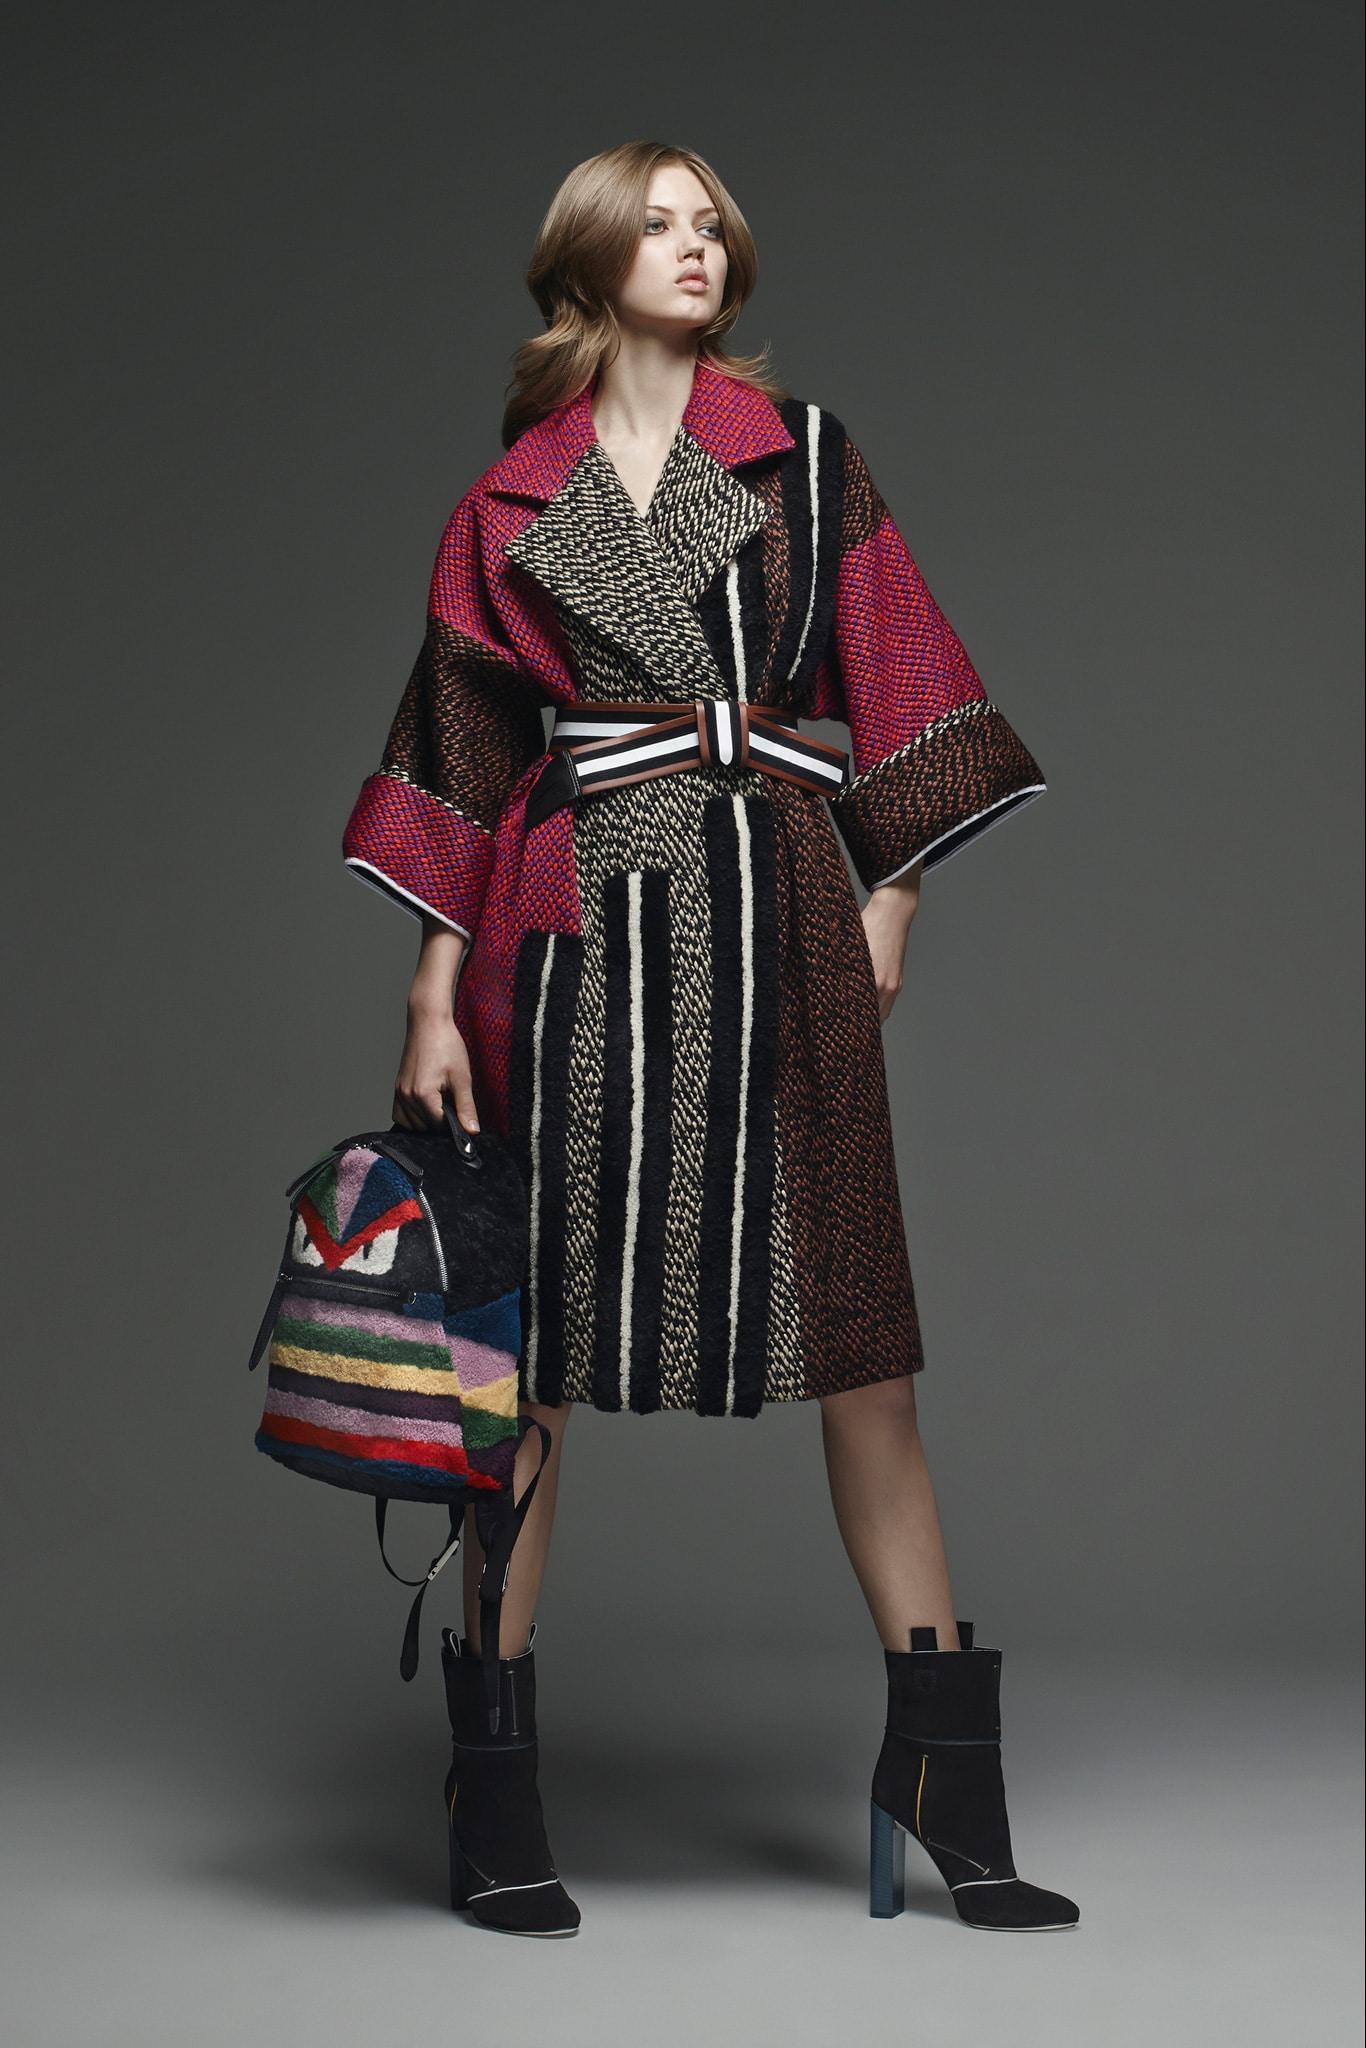 Fendi pre fall 2015 lookbook collection spotted fashion In style winter fashion 2014